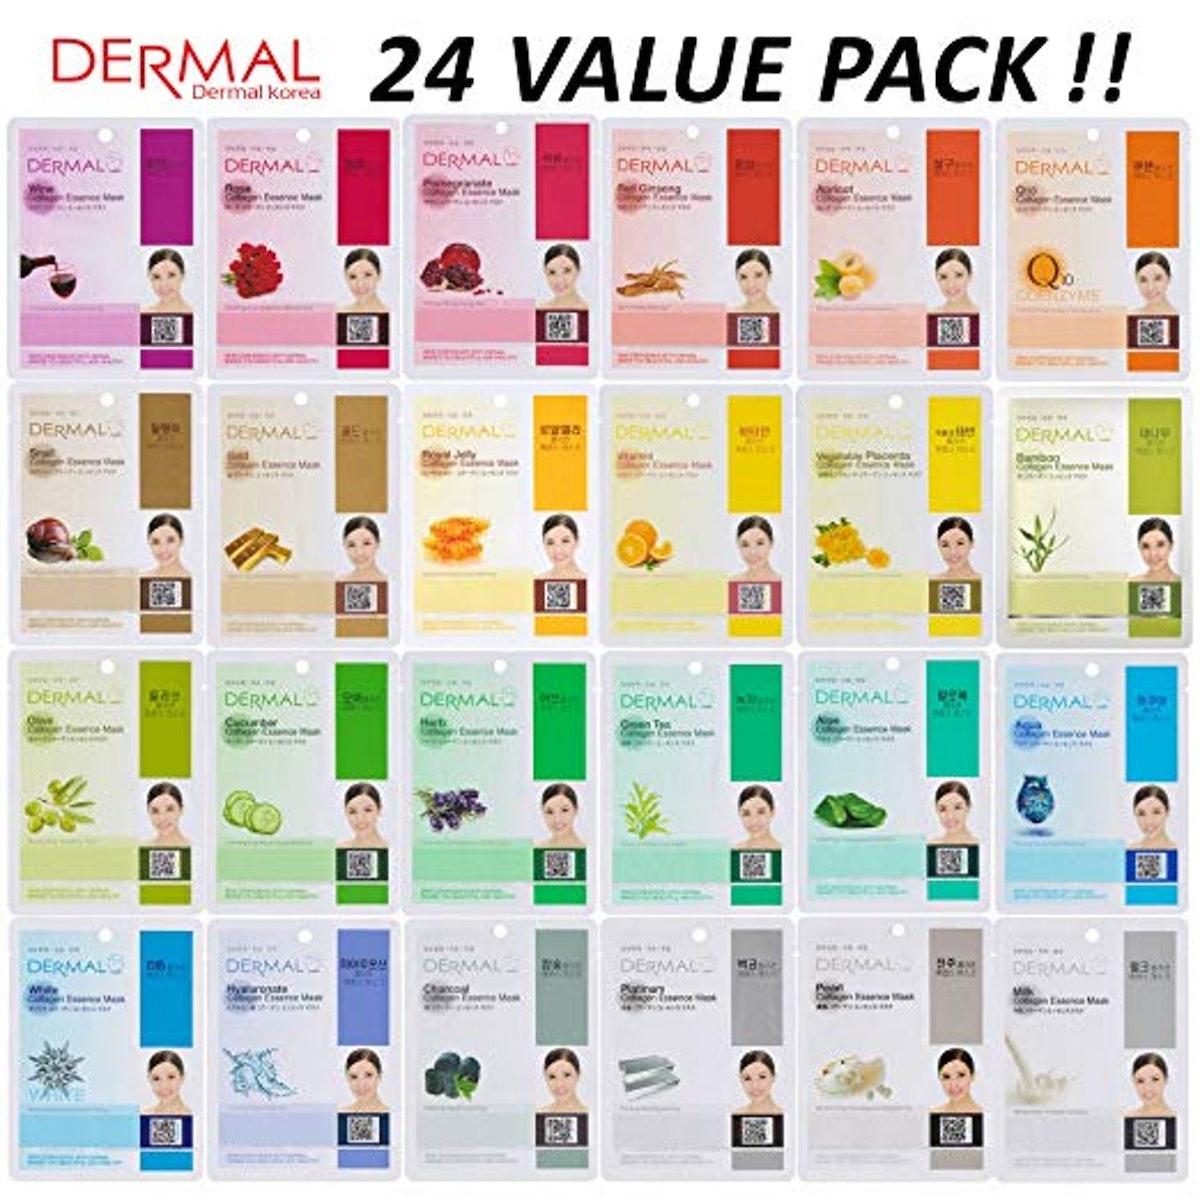 DERMAL Collagen Essence Full Face Facial Mask Sheet (24-Pack)